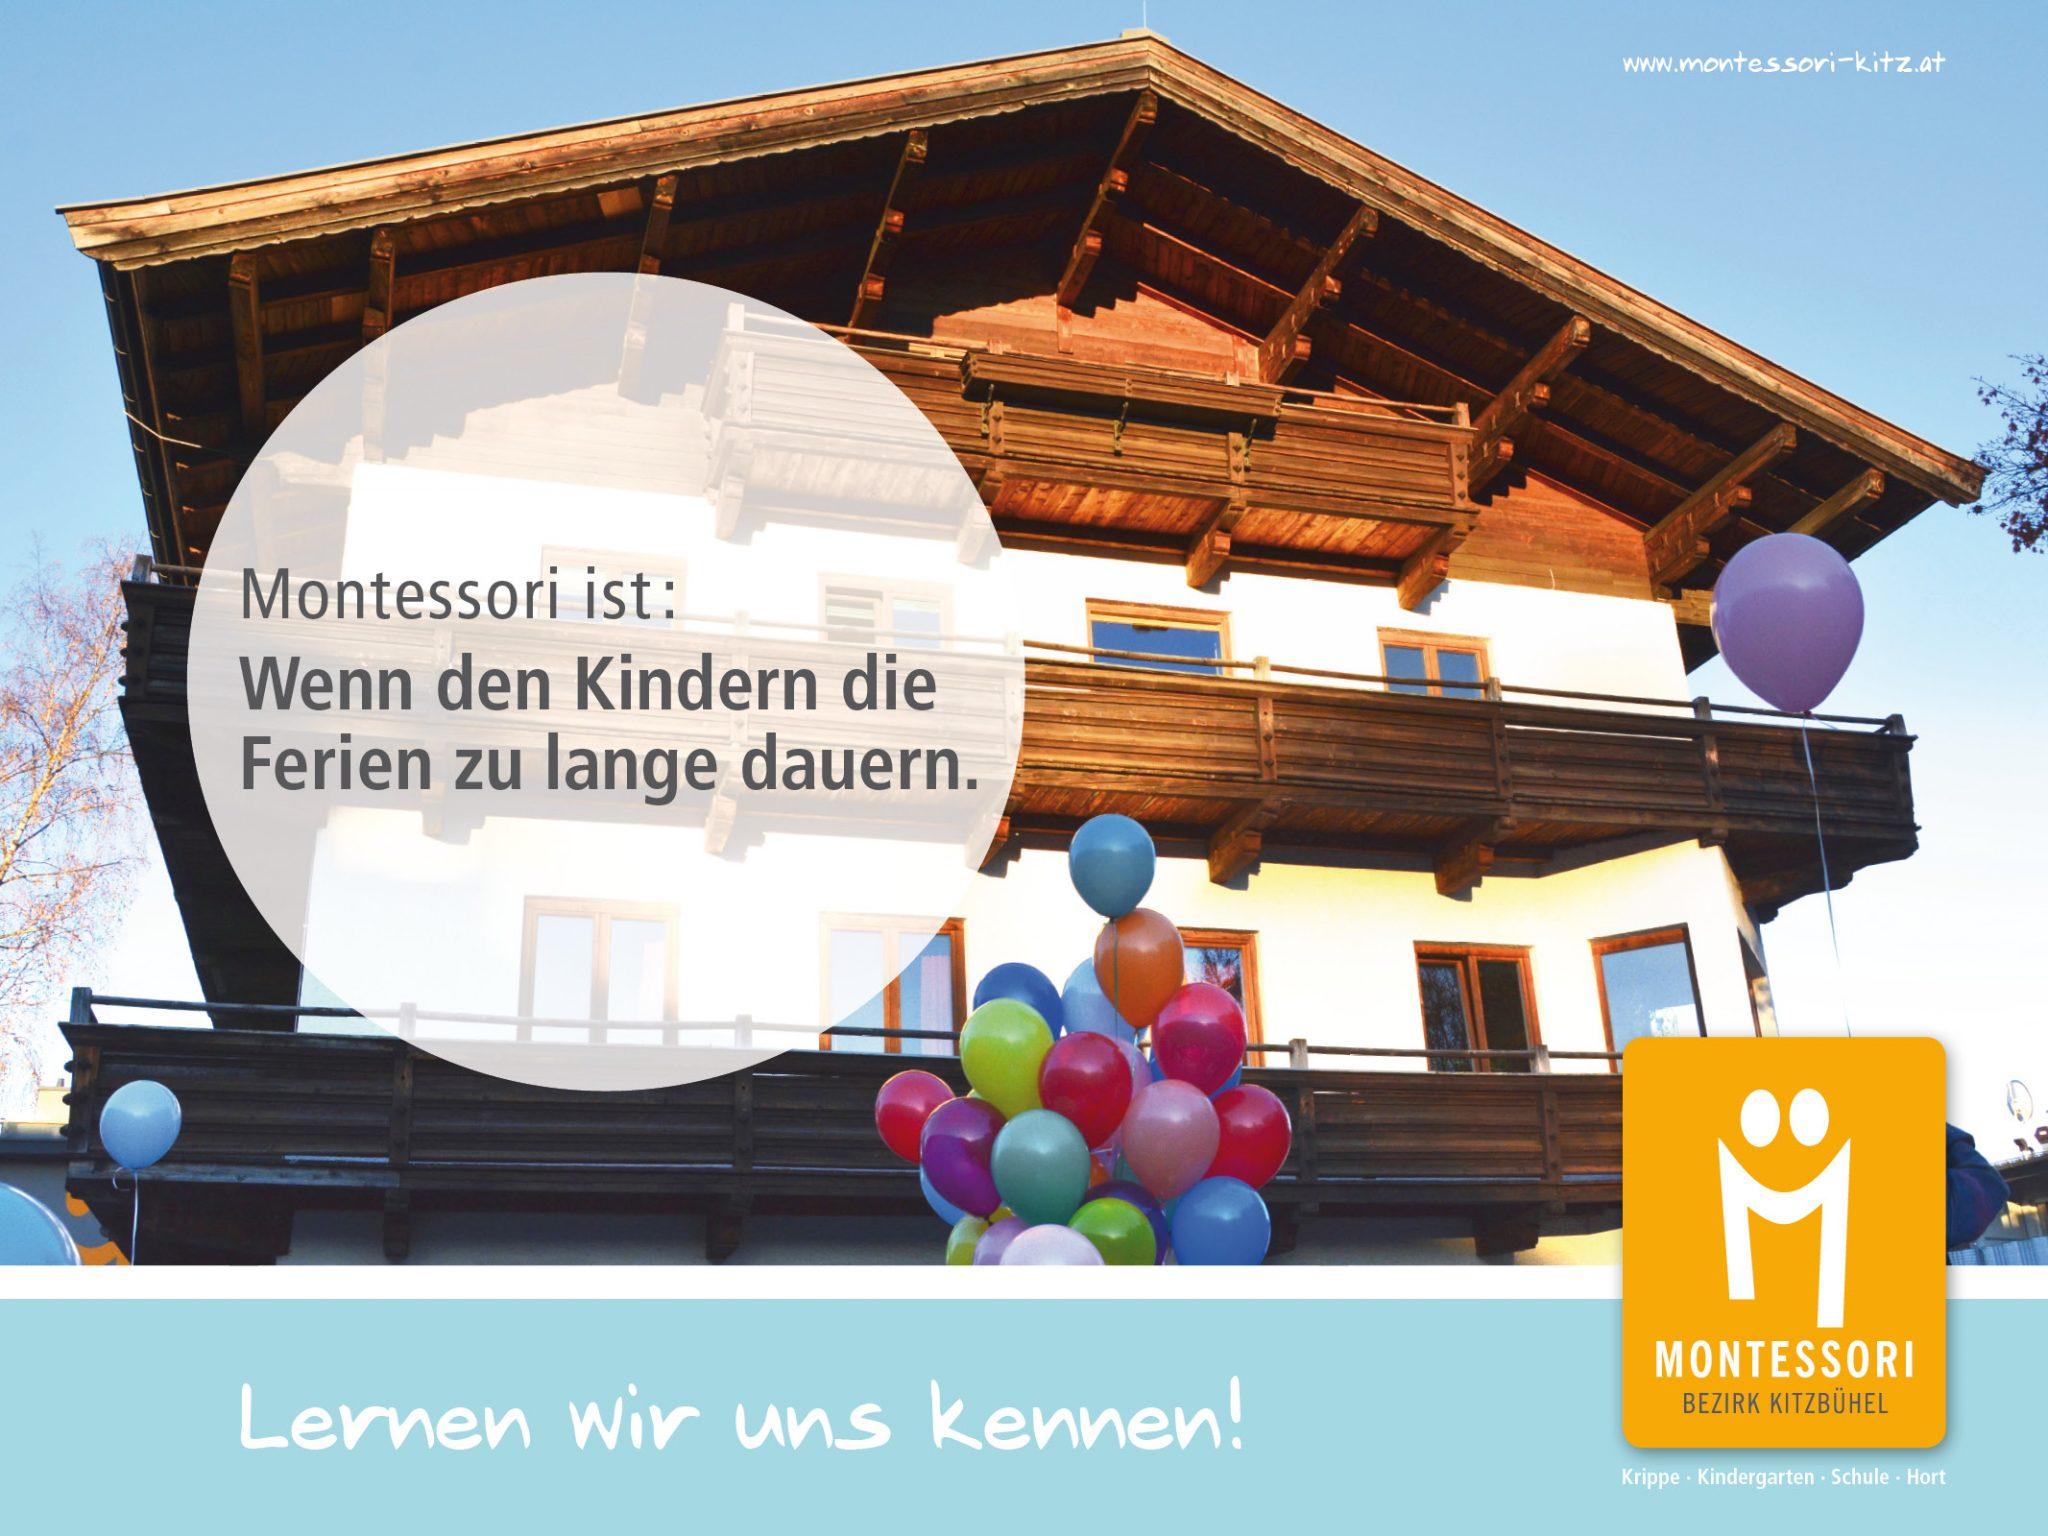 Montessori Haus st johann